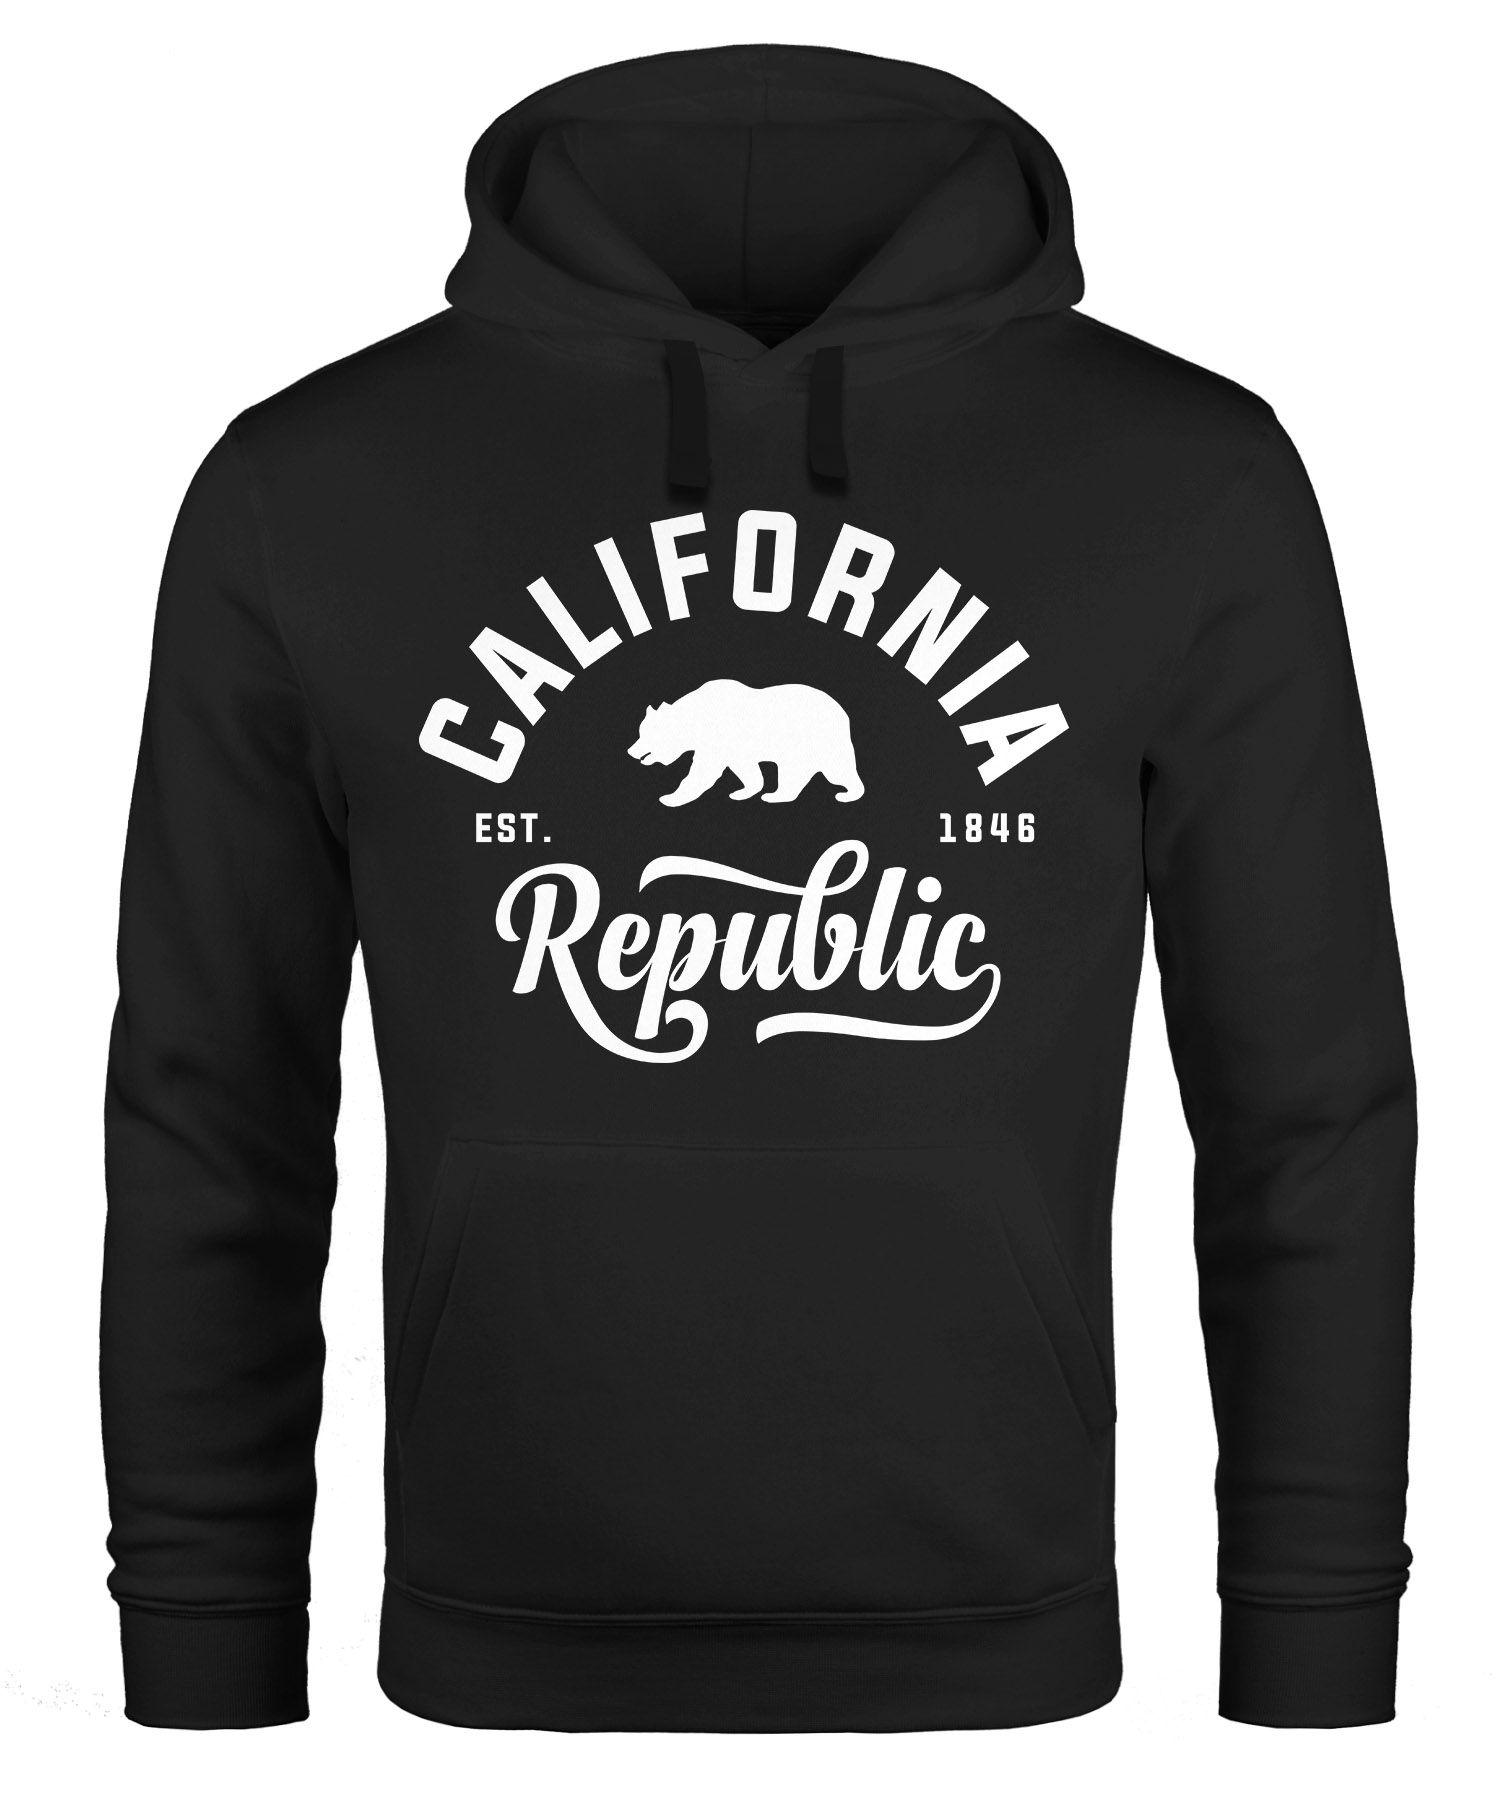 Details about Hoodie Mens California Republic Hooded Sweater Men Neverless ® show original title